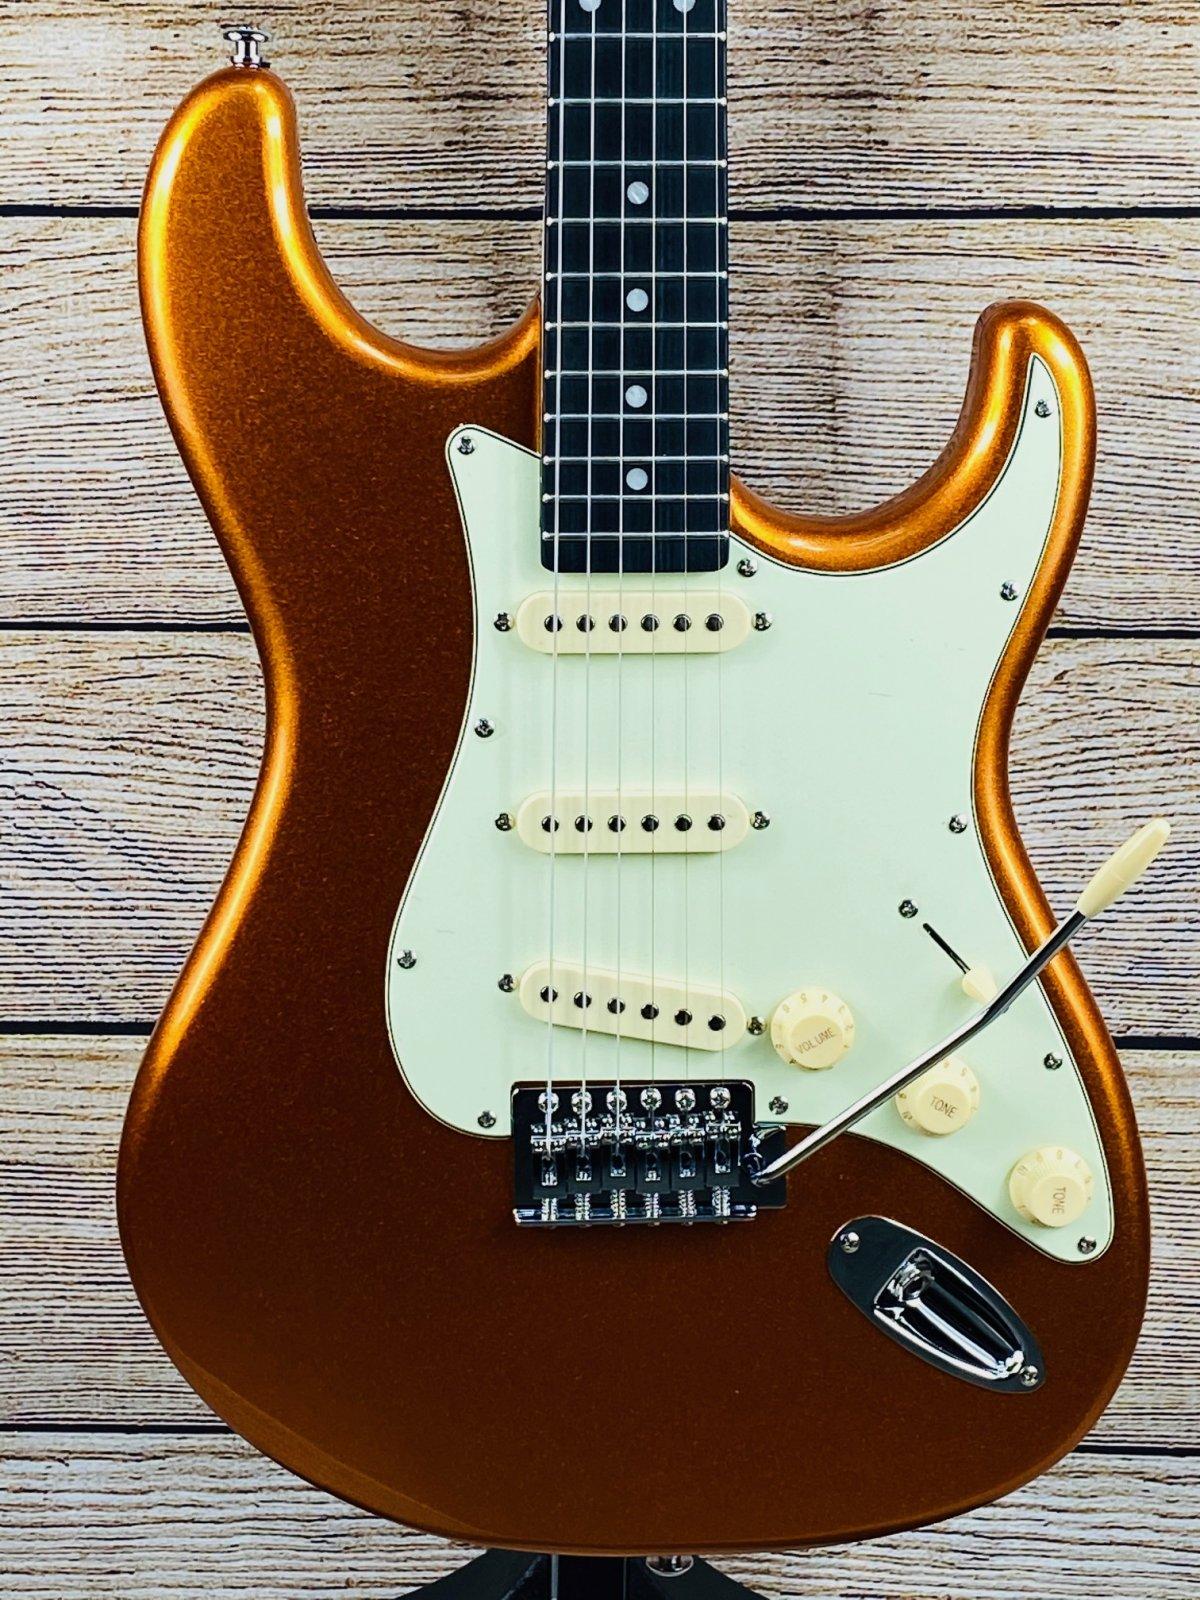 Tagima TG-500 Electric guitar - Metallic Gold